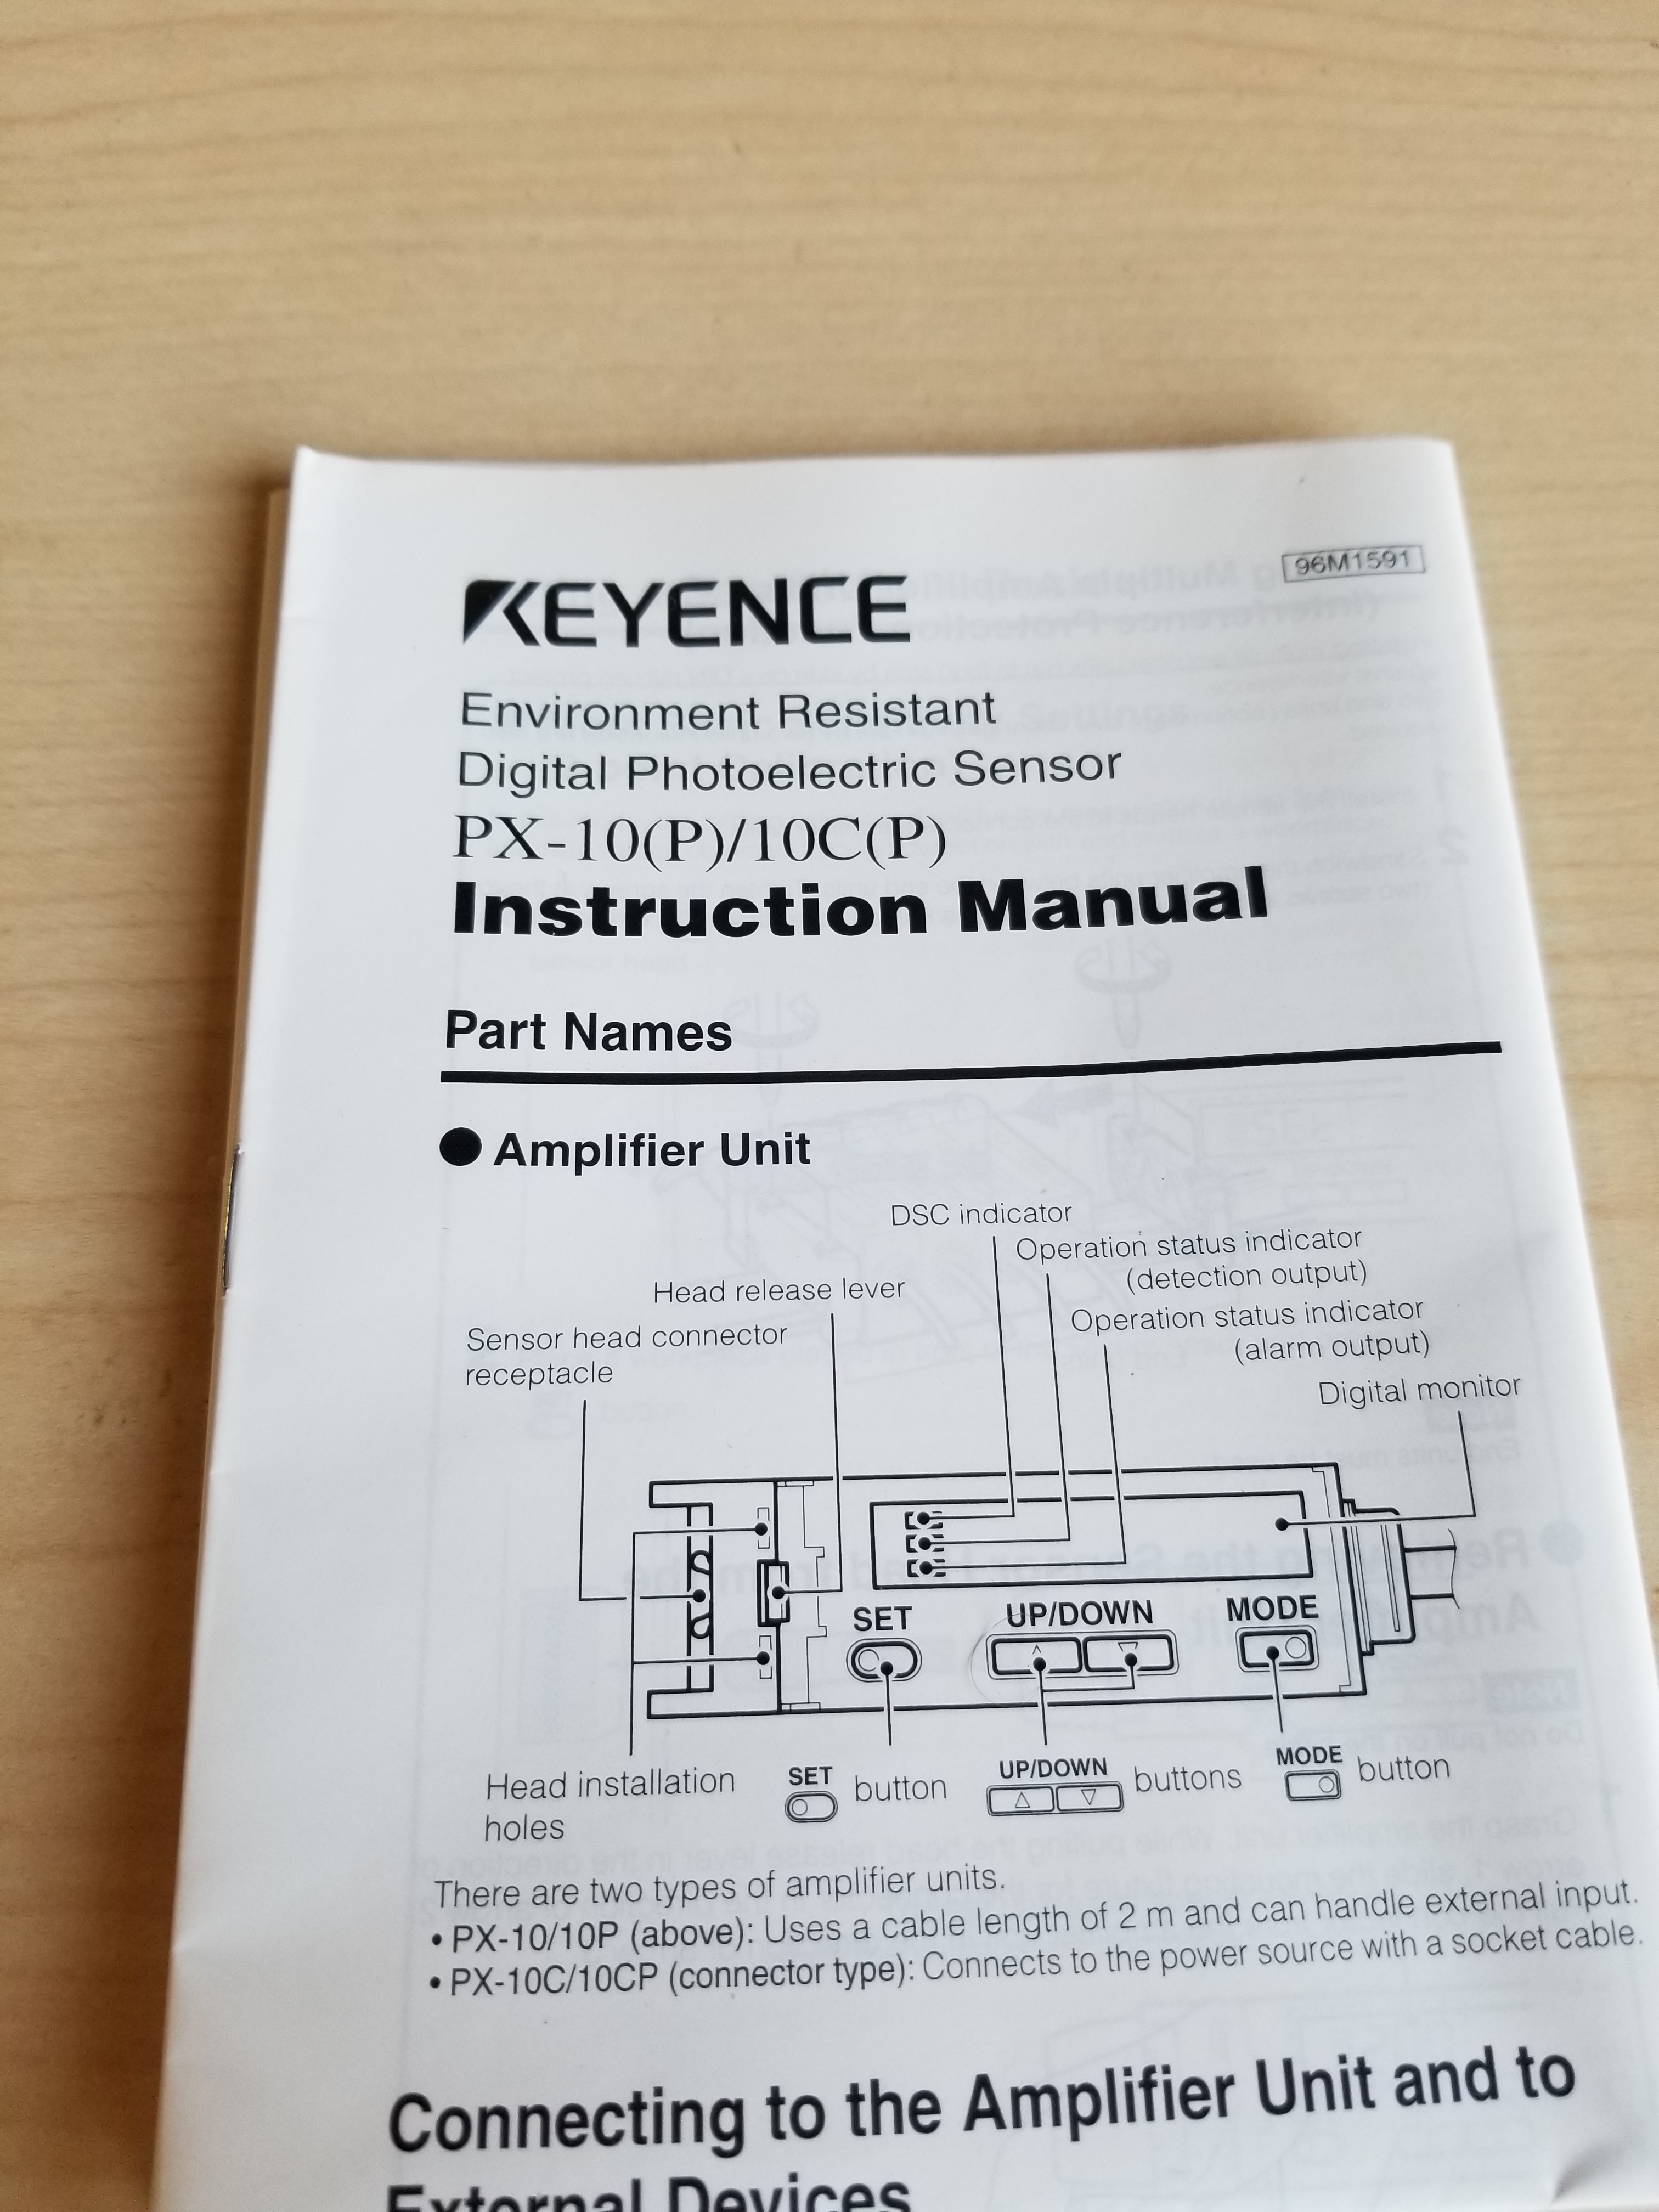 New Keyence Environment Resistant Digital Photoelectric Sensor PX-10 - Image 5 of 5